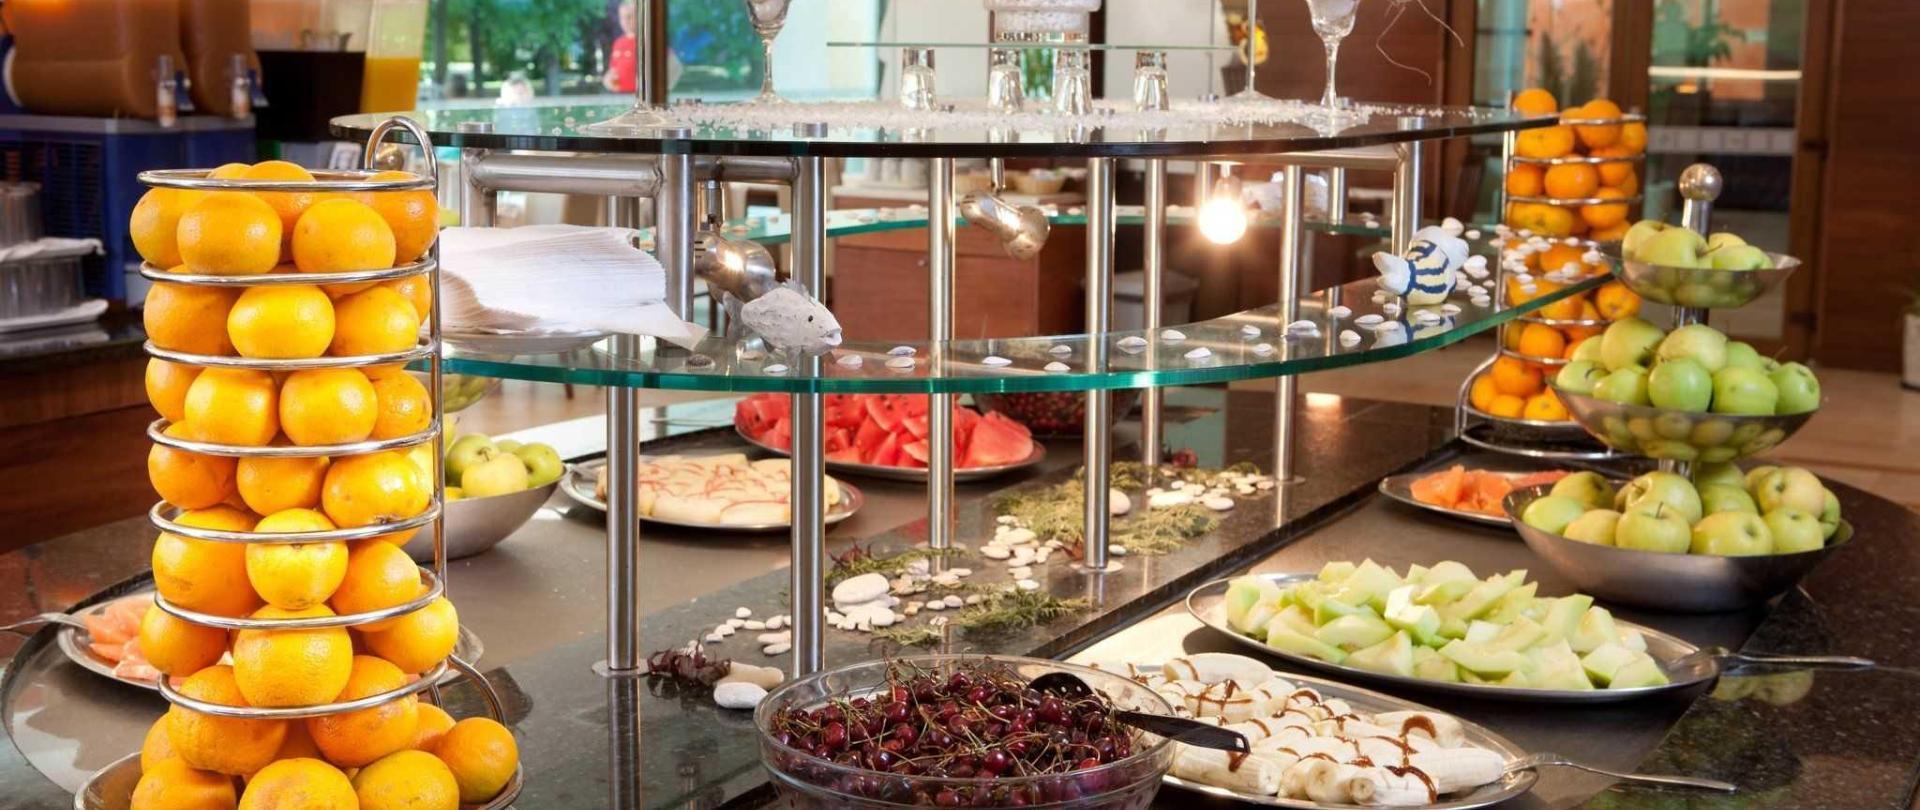 restaurant-ralitsa-superior-2.jpg